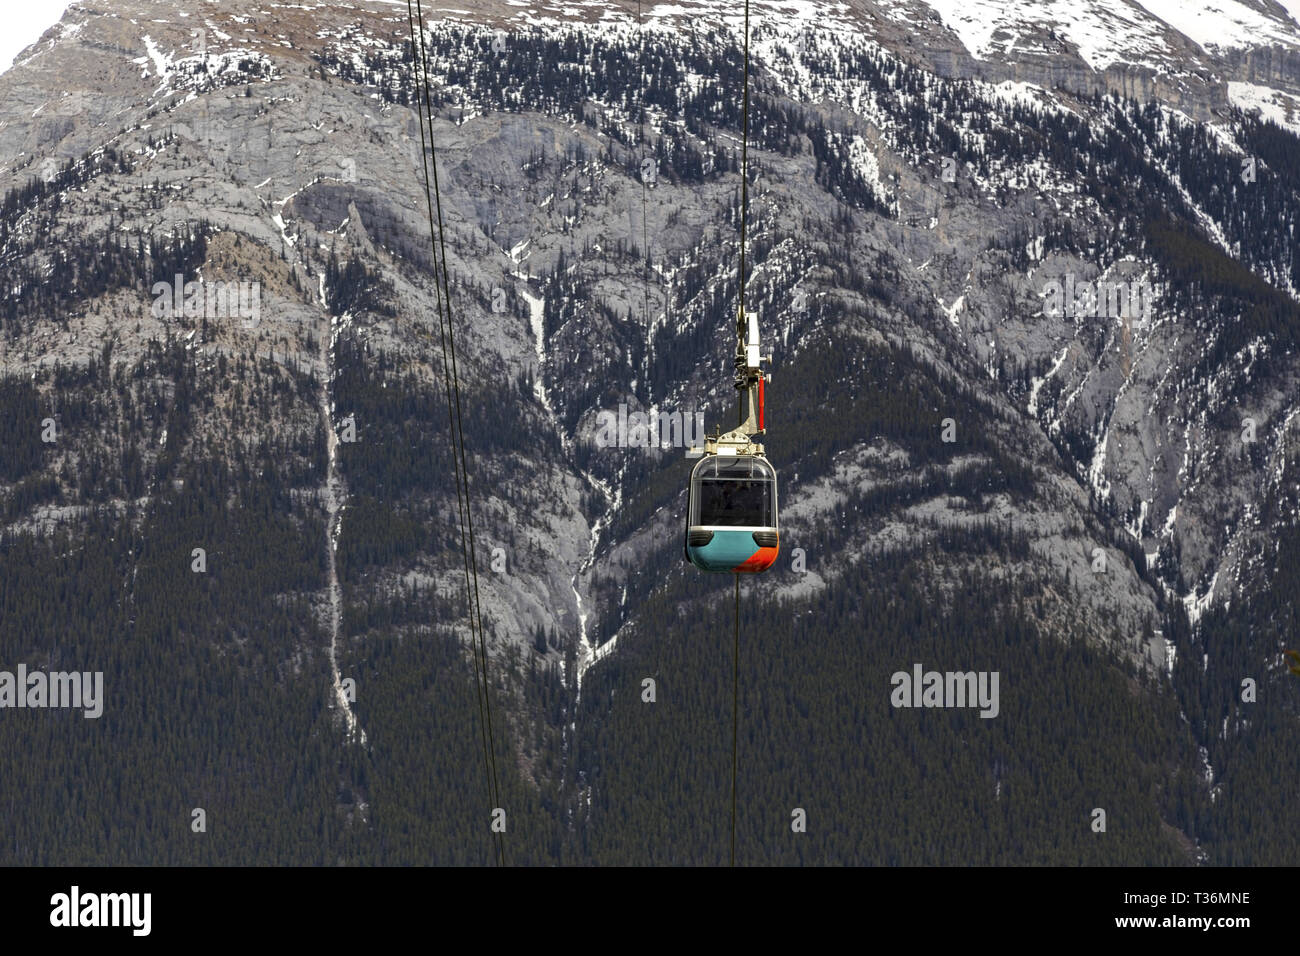 Sulphur Mountain Gondola Cable Car Cabin With Rundle